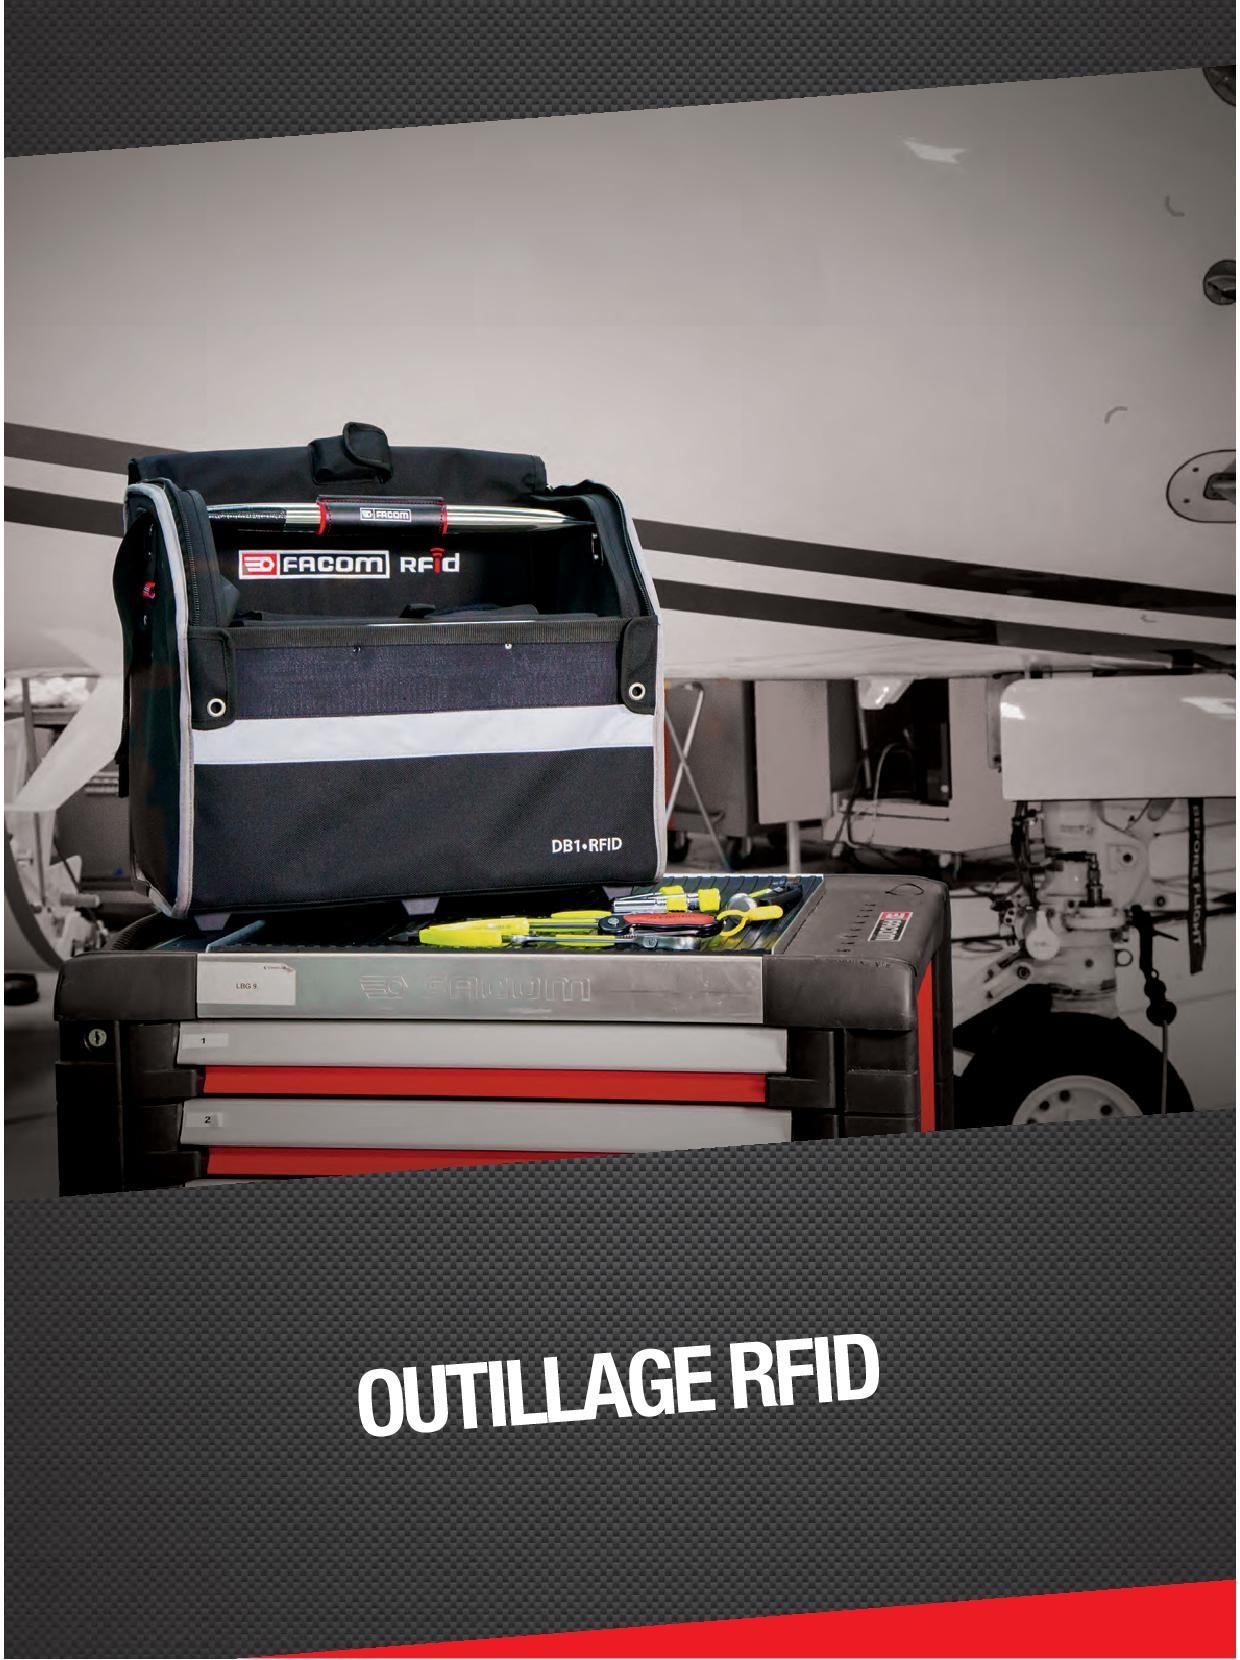 OUTILLAGE RFID